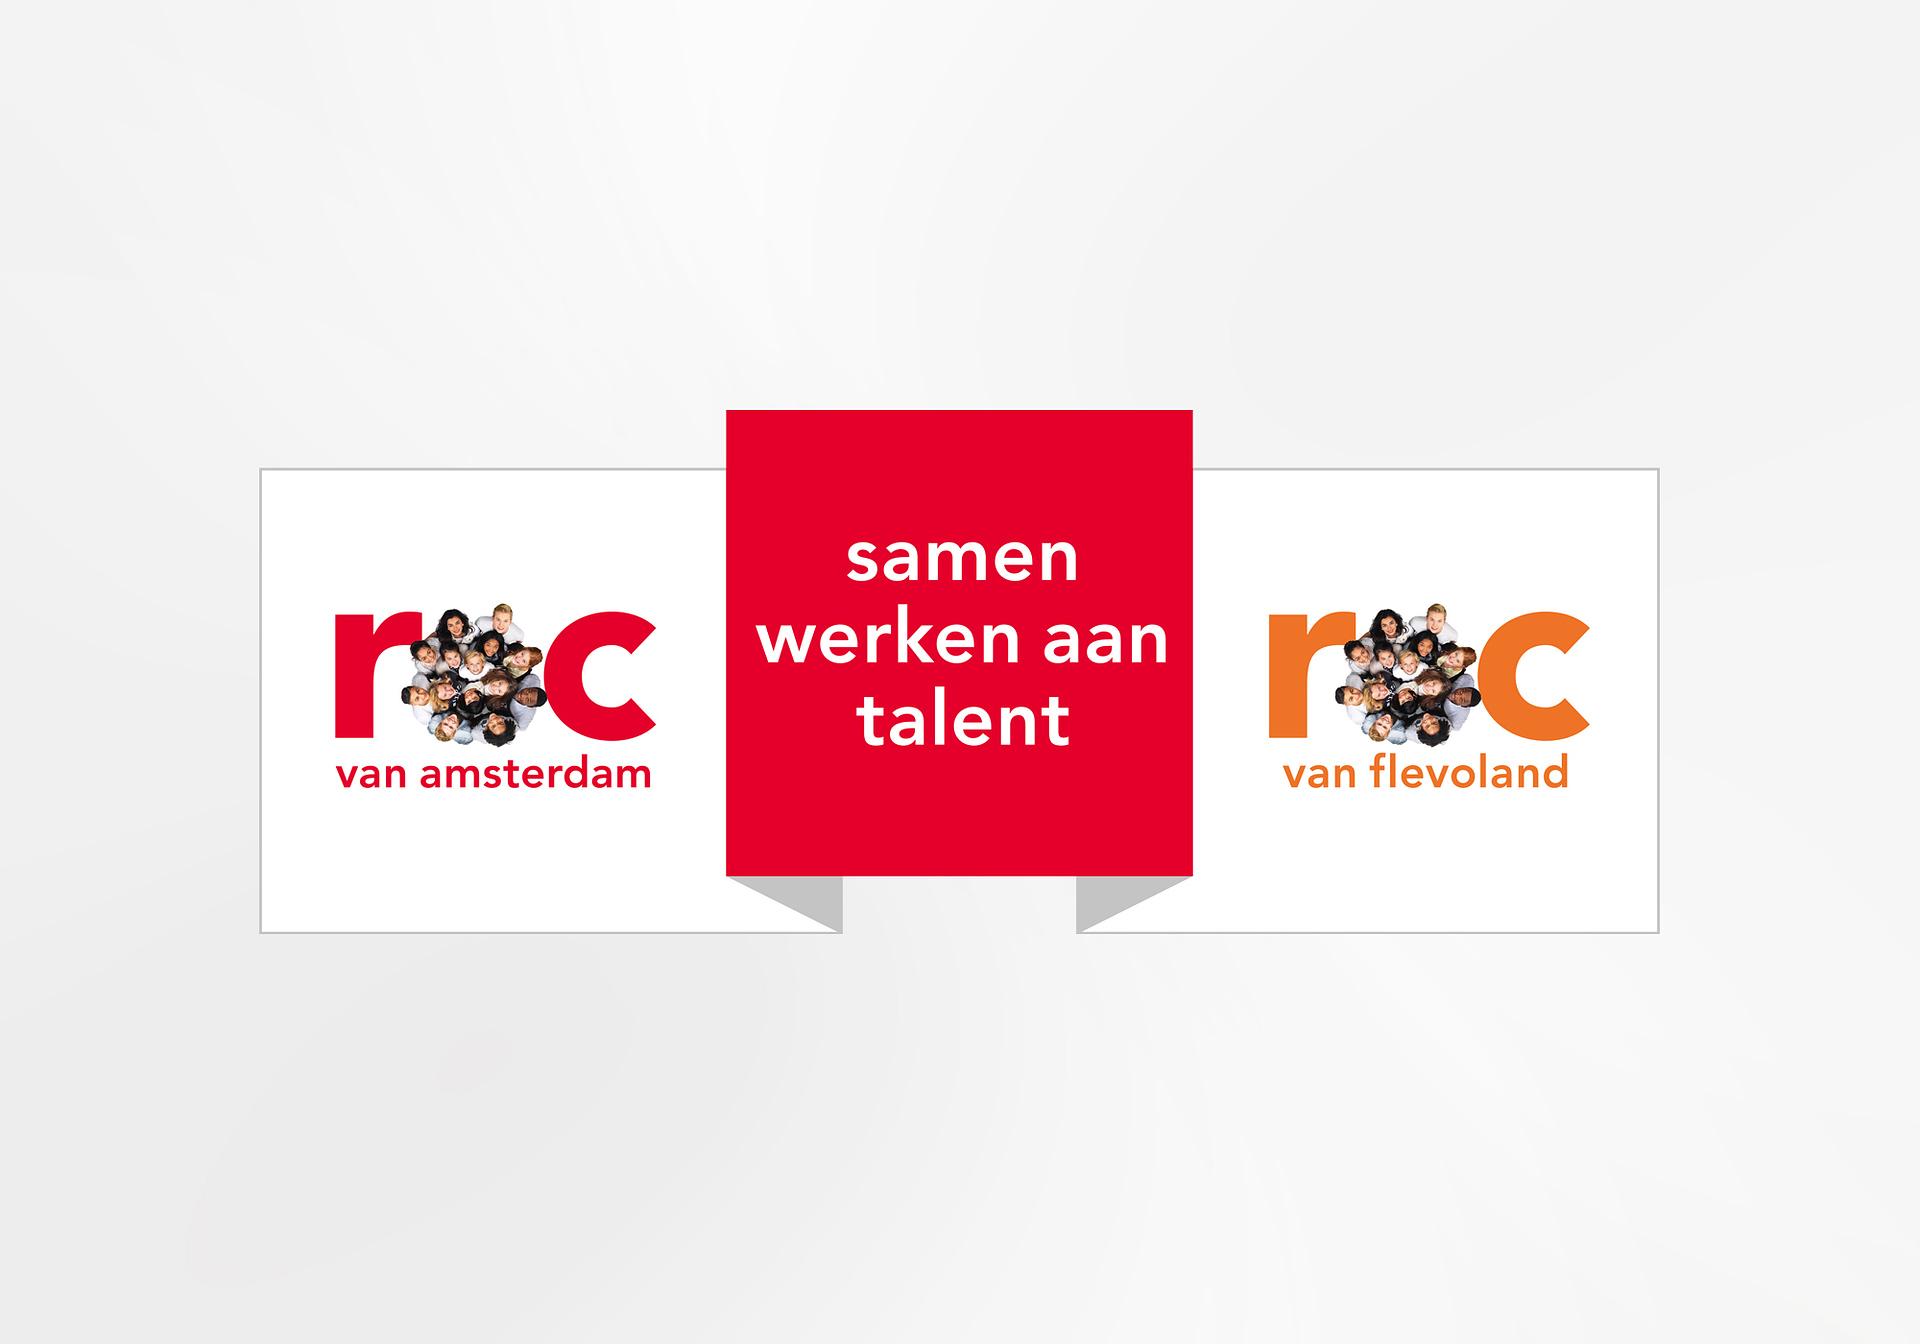 ROC van Amsterdam & Flevoland